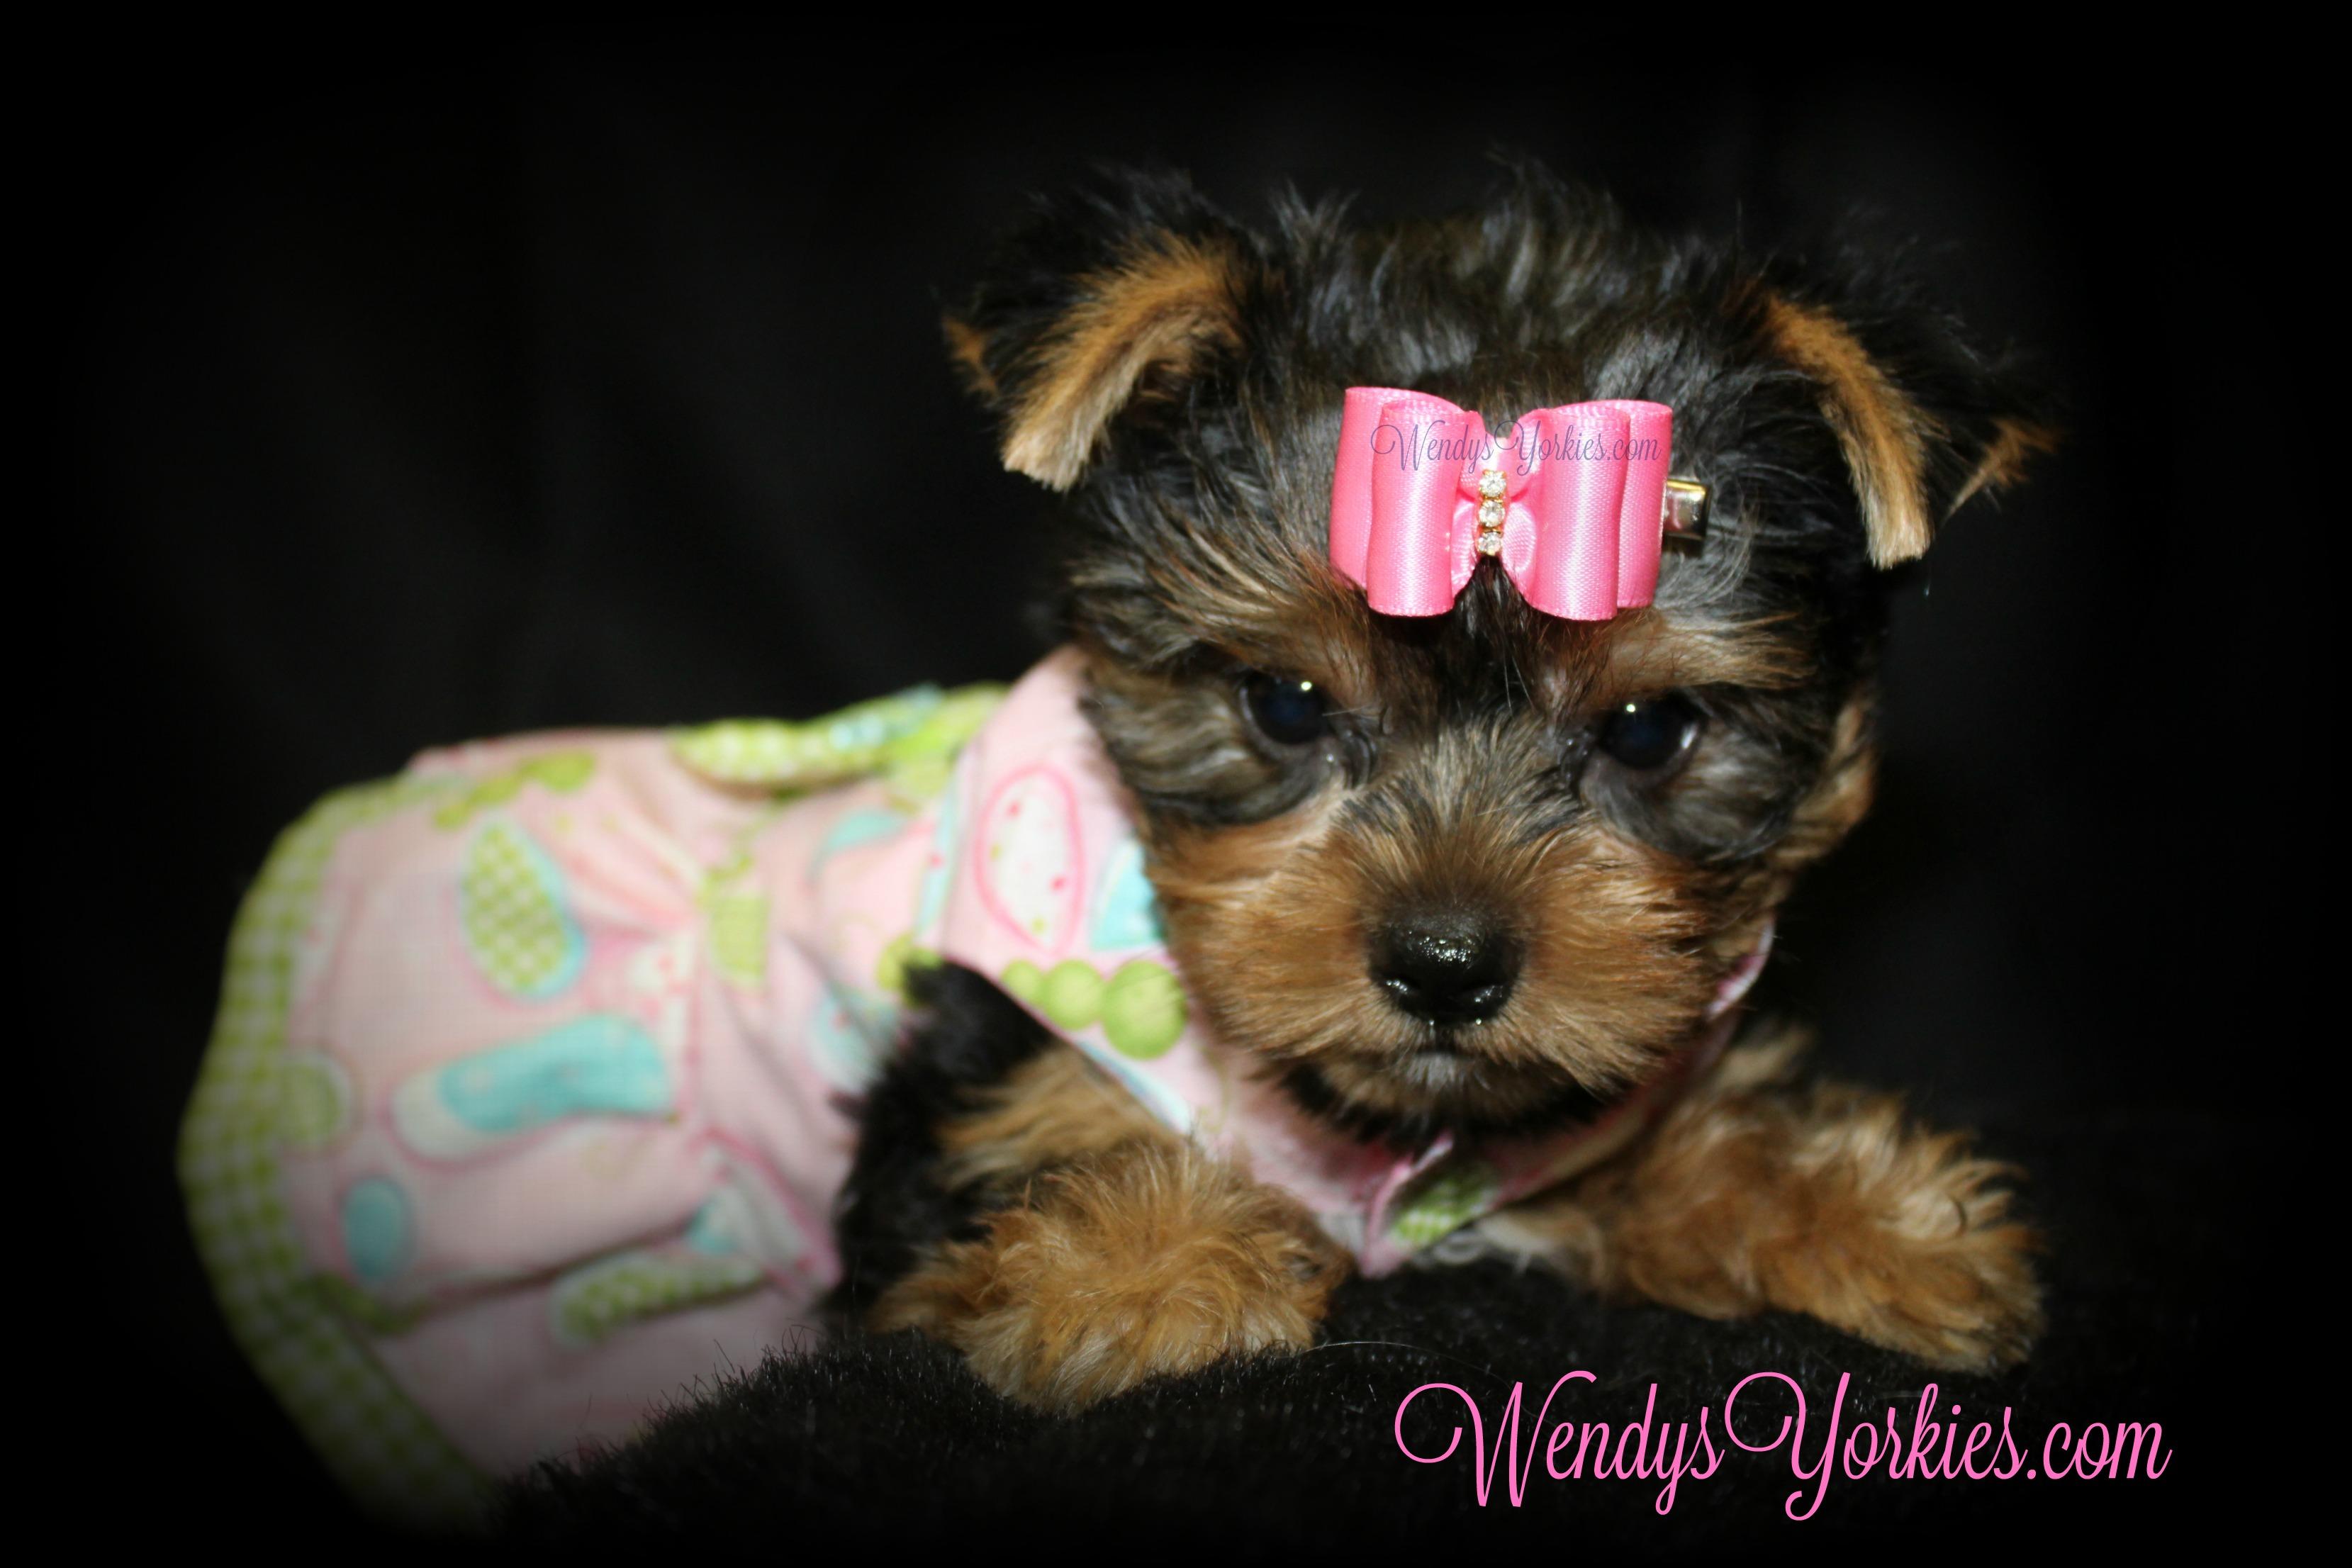 Teacup Girl Yorkie puppies for sale, WendysYorkies.com, Grace f1